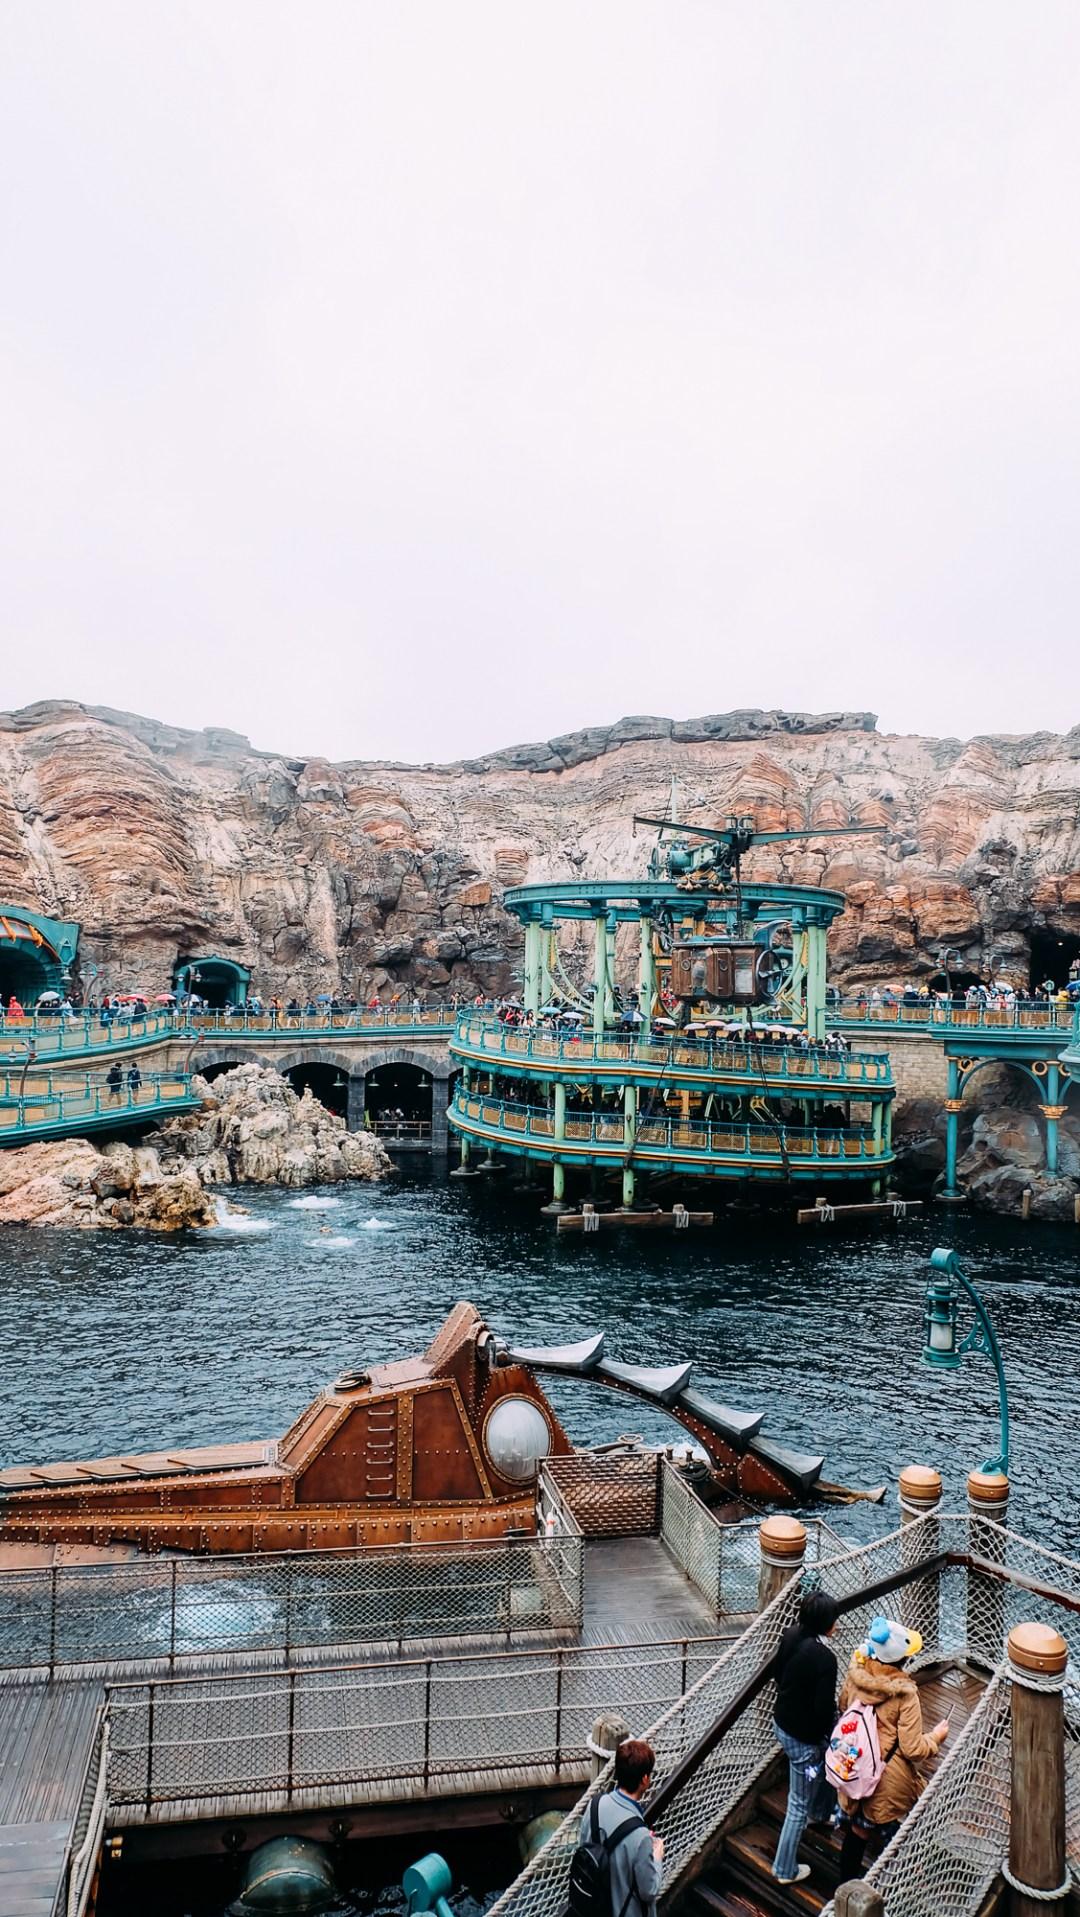 Japan Disney Sea (7 of 50)